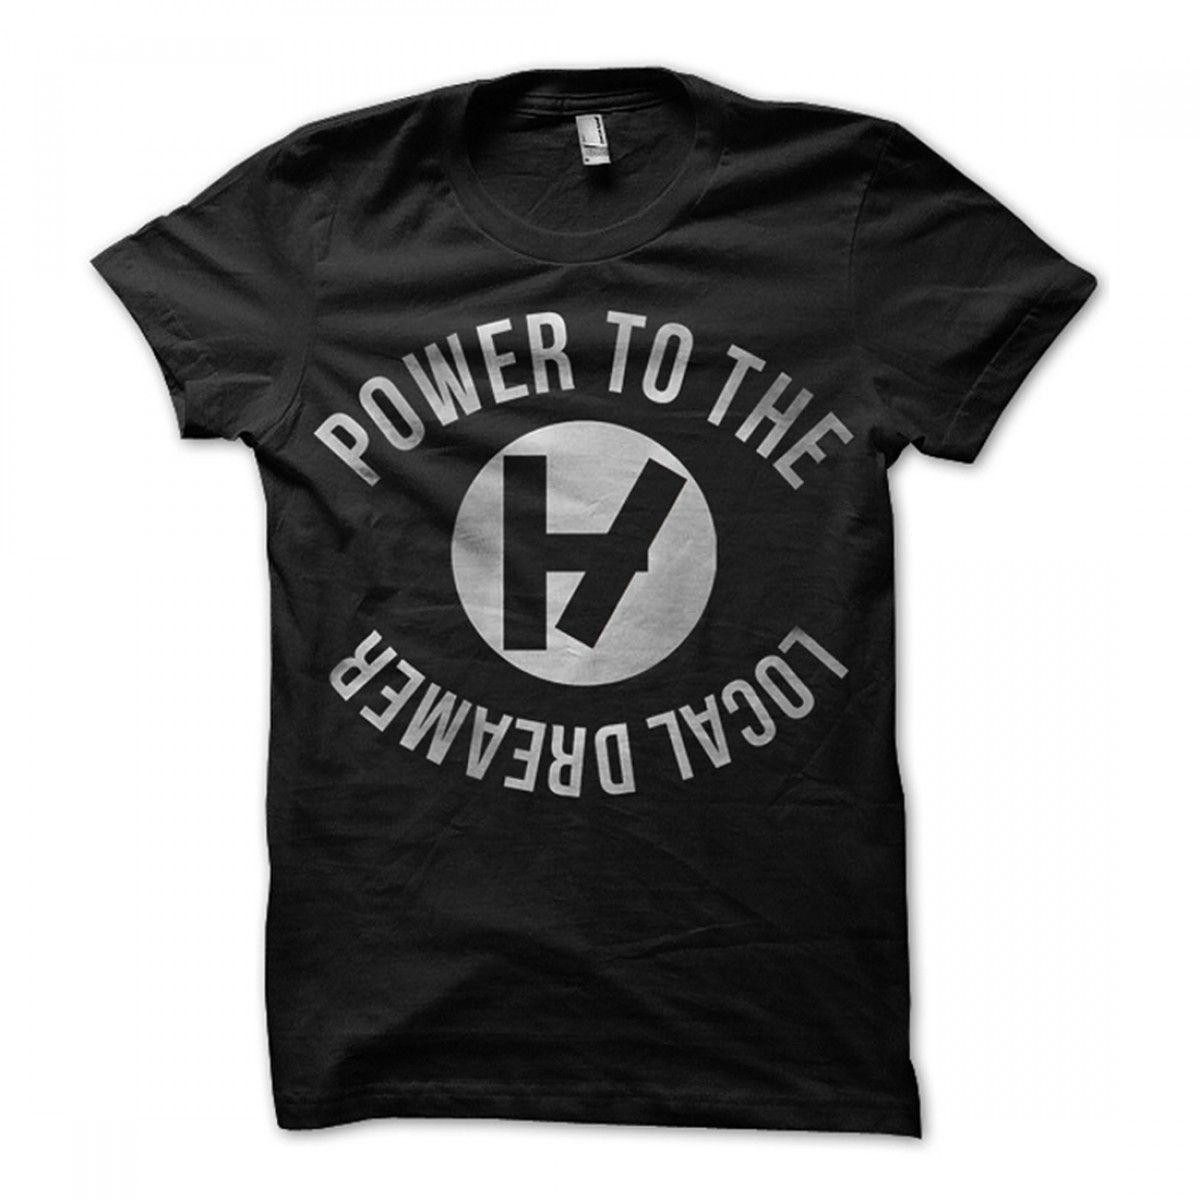 Power To Local Dreamer Twenty One Pilots Store Shirts